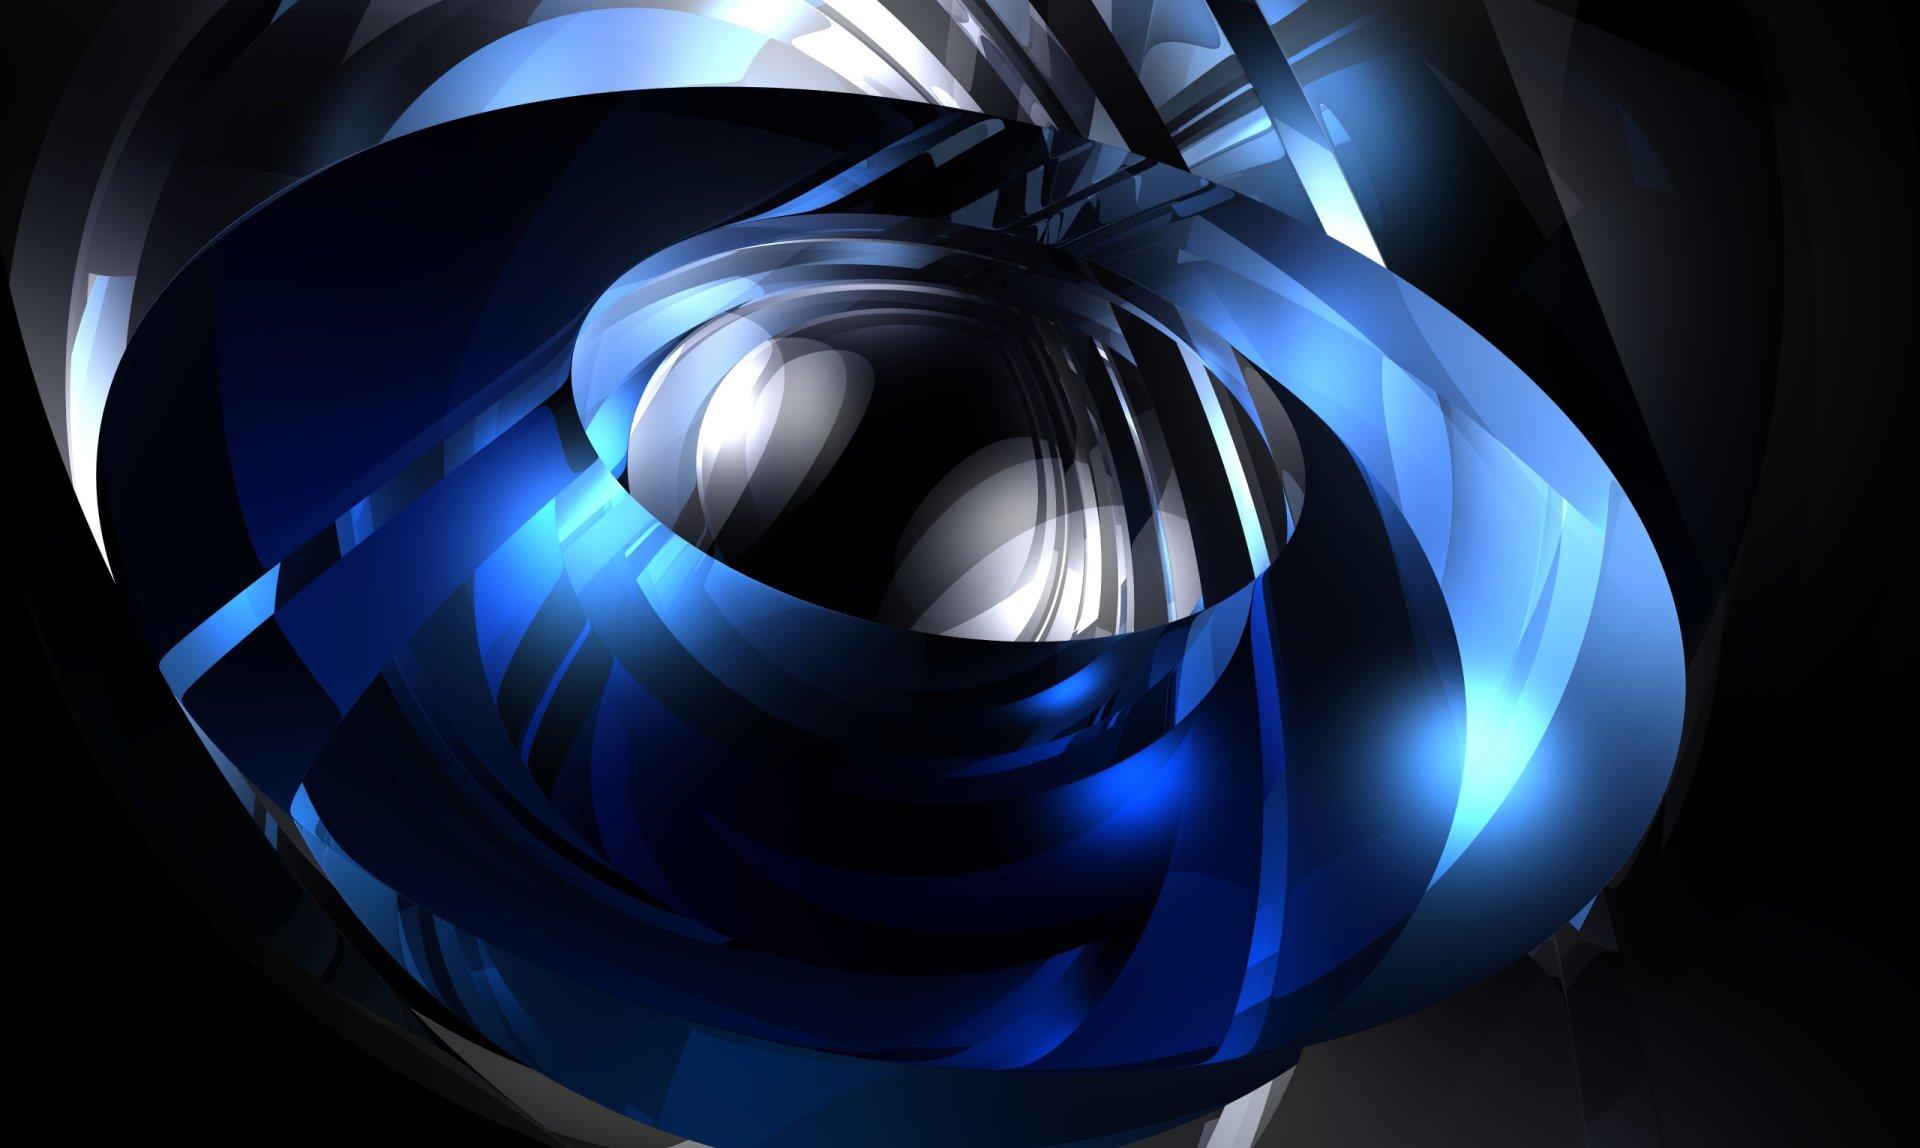 Abstract - Digital Art  Fractal Wallpaper